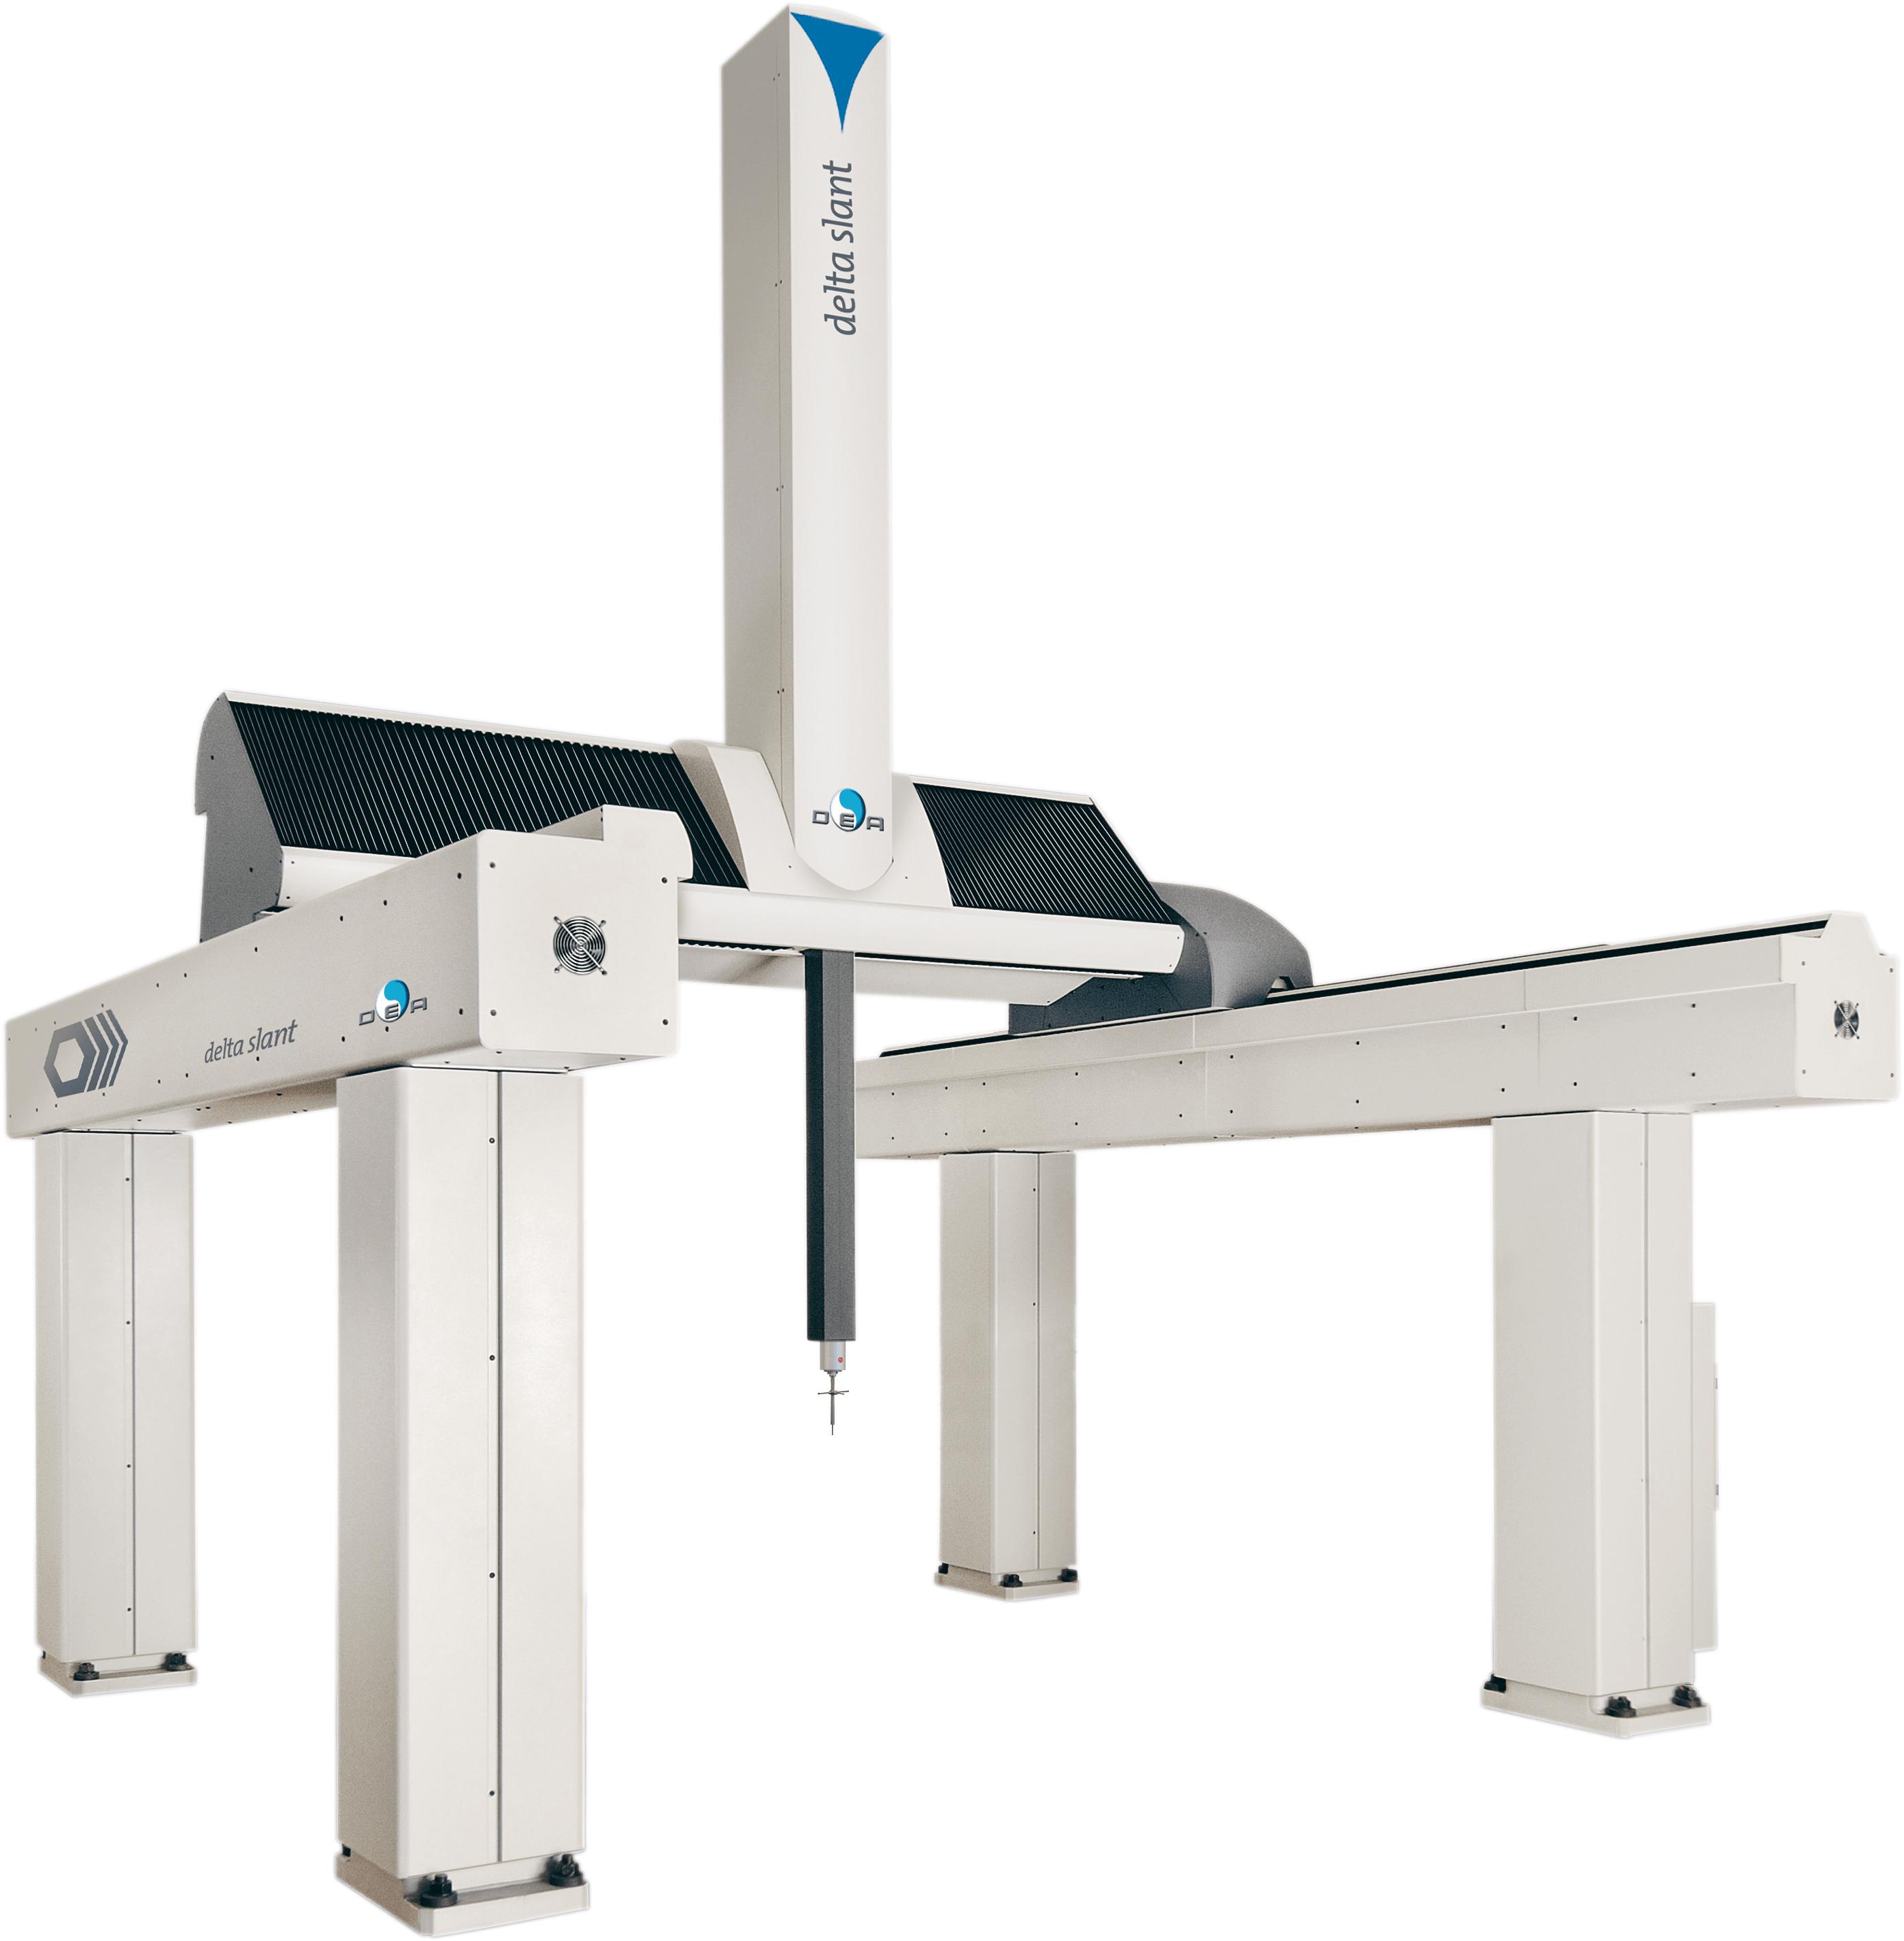 Coordinate Measuring Machines Cmm Information Engineering360 Transimpedance Amplifiers Gantry Image